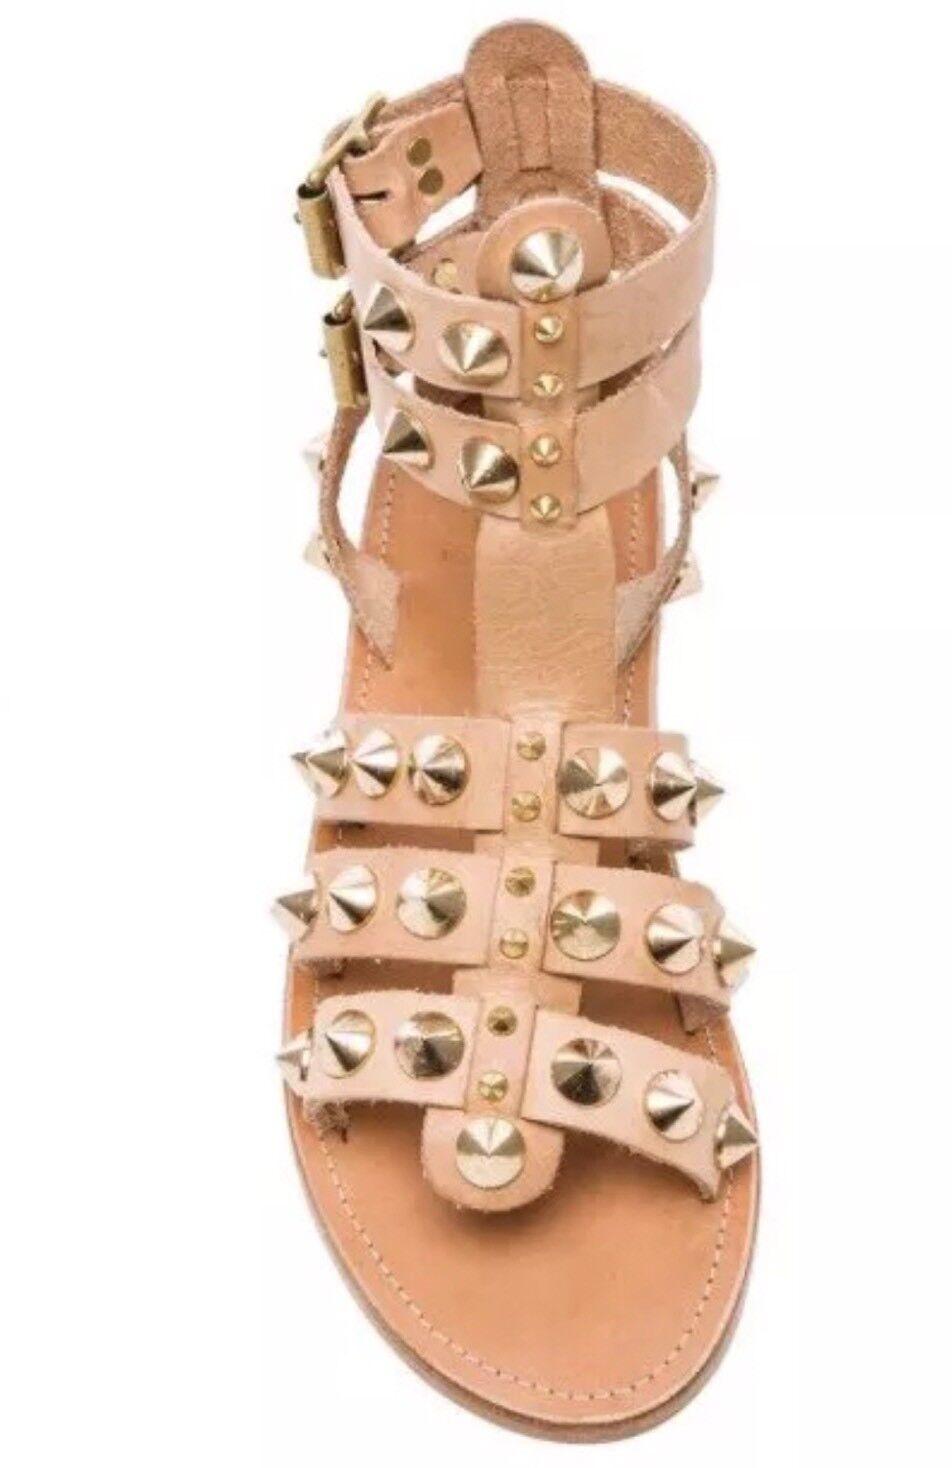 308 Authentic Anine Bing Leder Studded Sandale 10